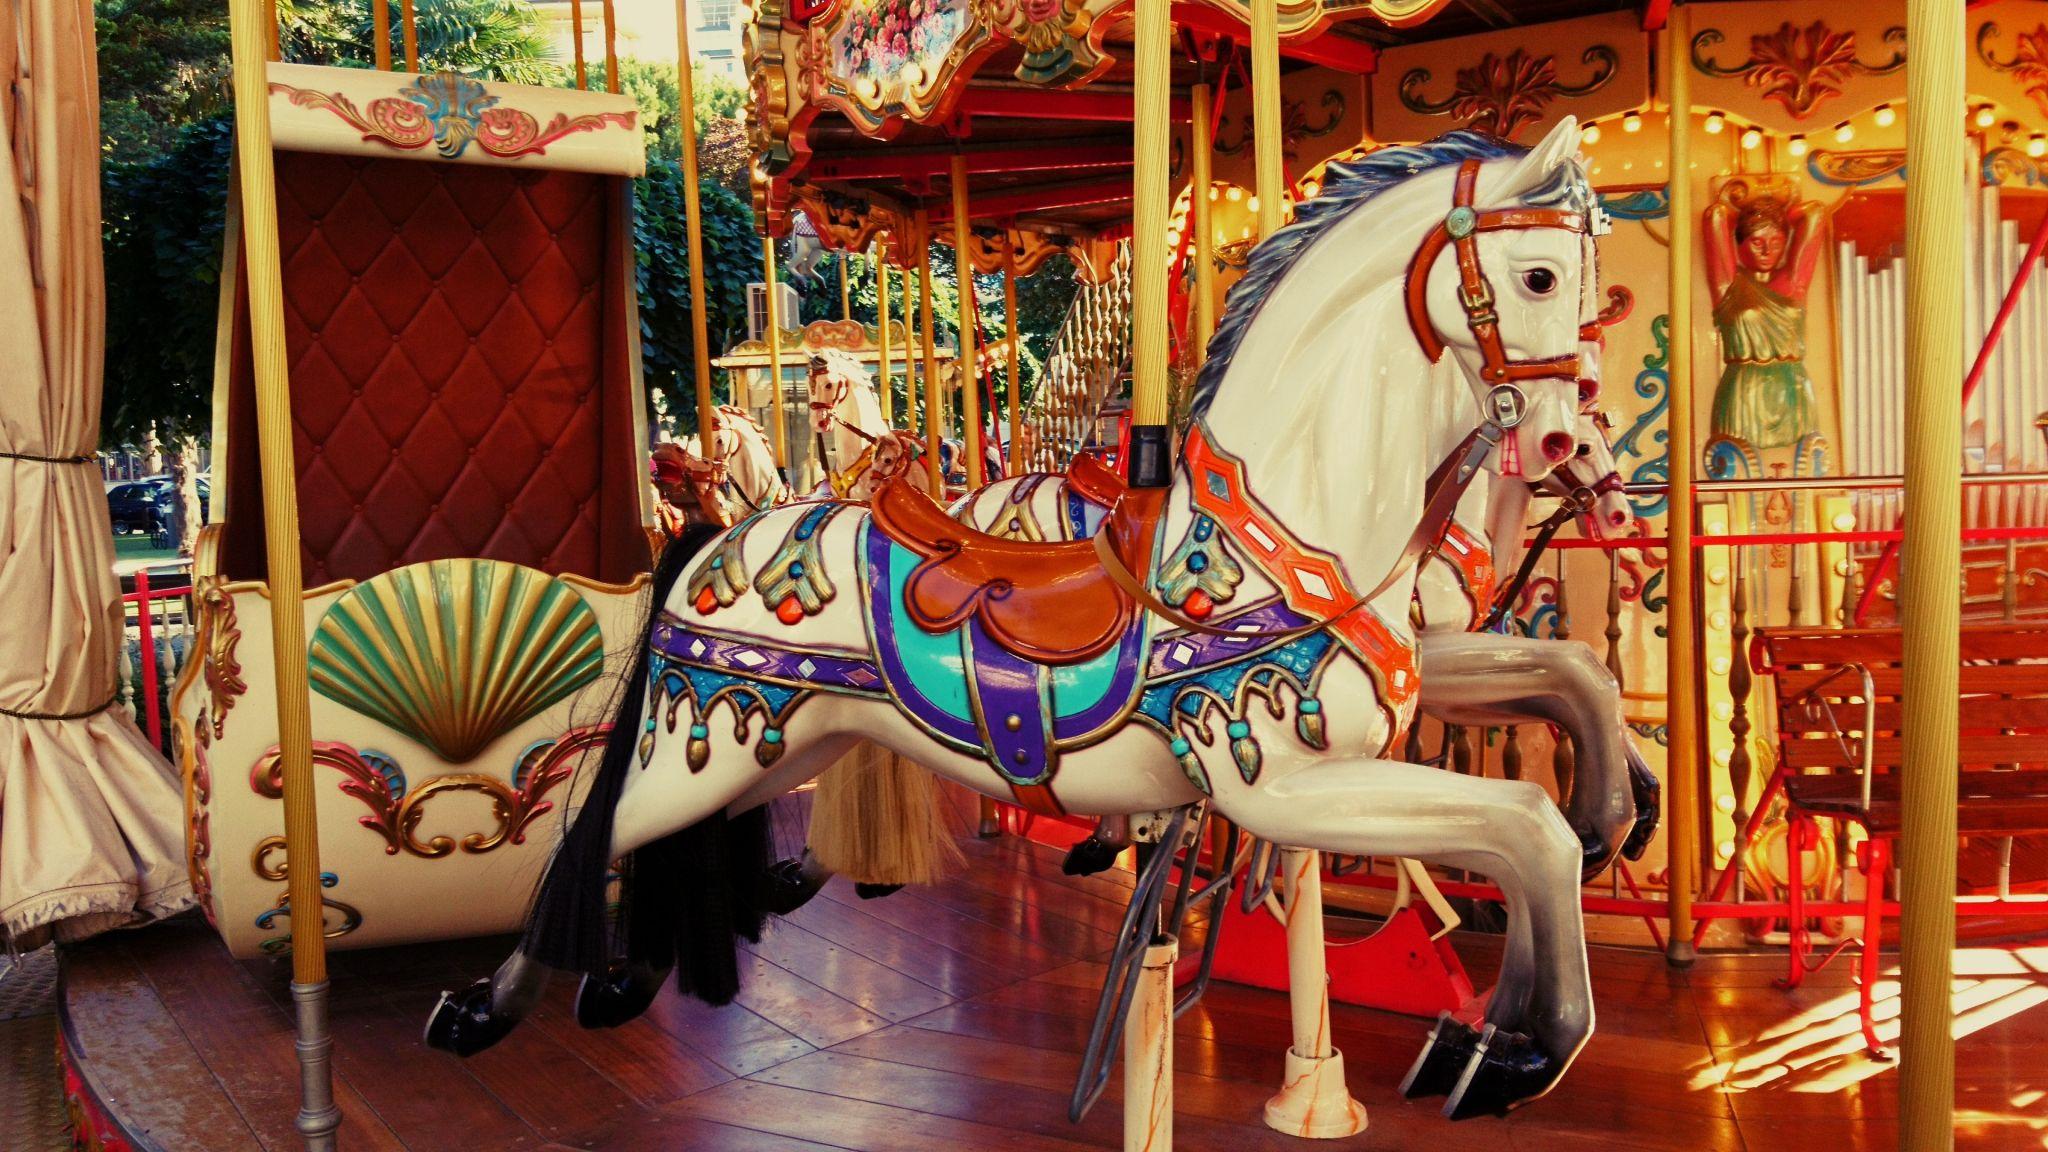 Old carousel, Lignano, Italy